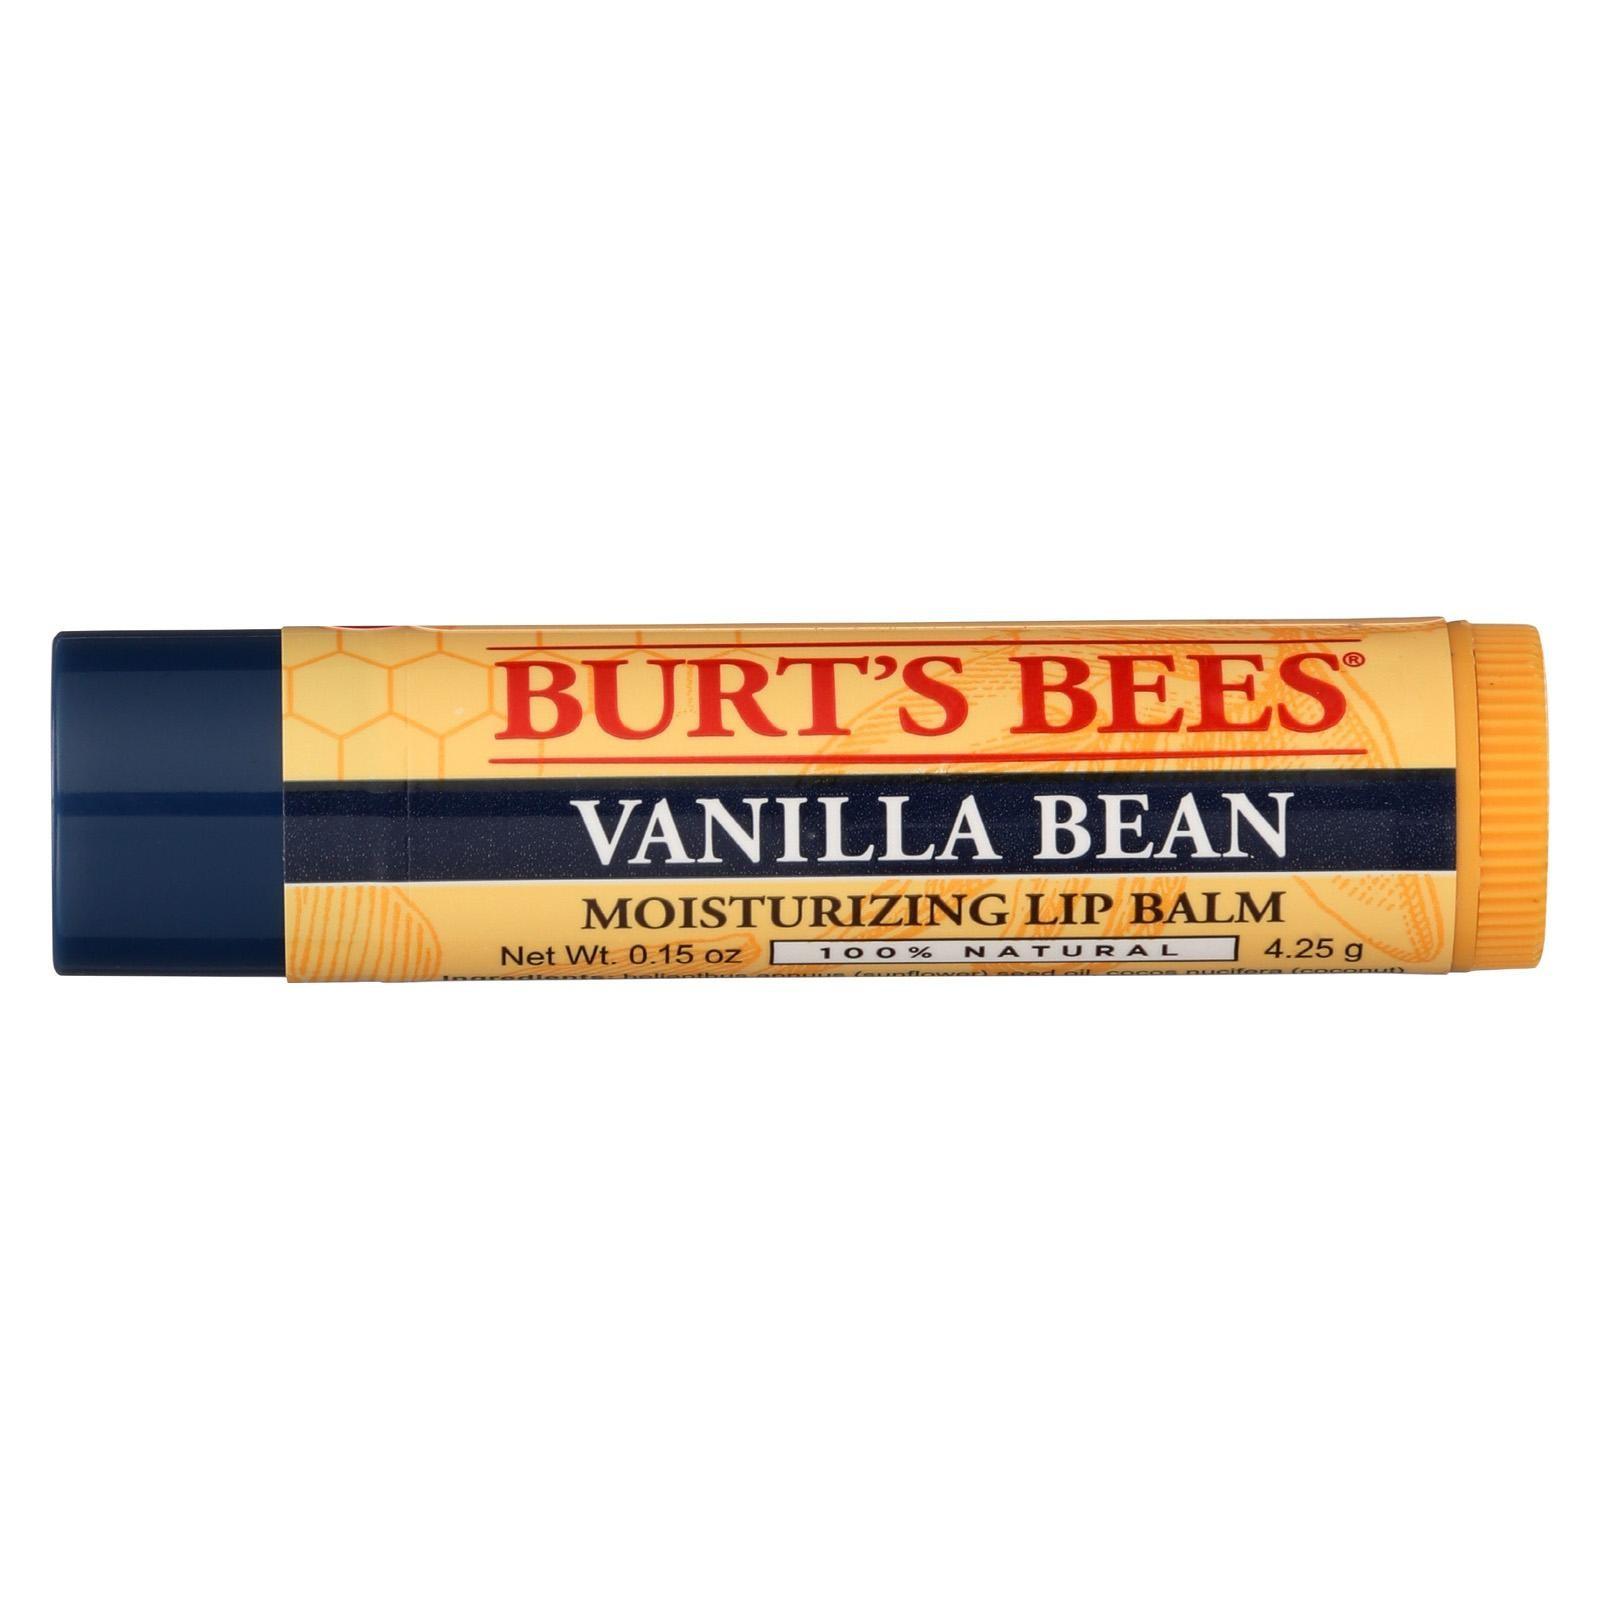 Burts Bees - Lip Balm - Vanilla Bean - Pack of 12 - 1 Count - image 1 de 1